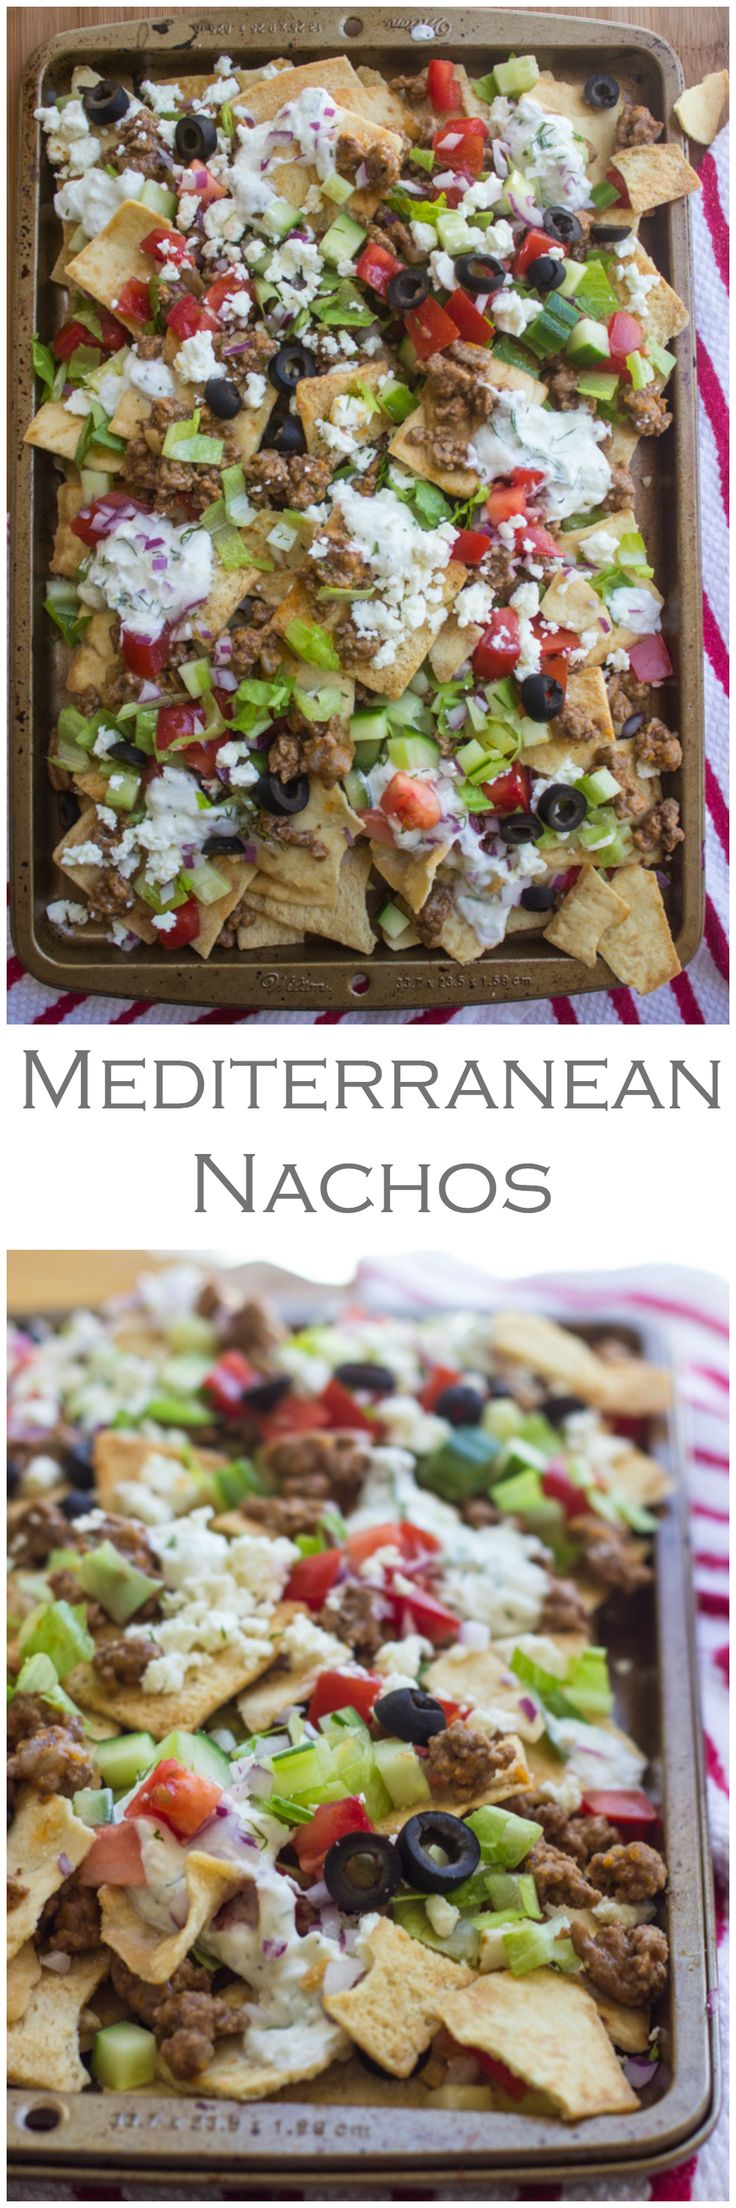 Mediterranean Nachos // layers crispy pita chips, meat, fresh veggies, feta & homemade tzatziki sauce #appetizer #movienight